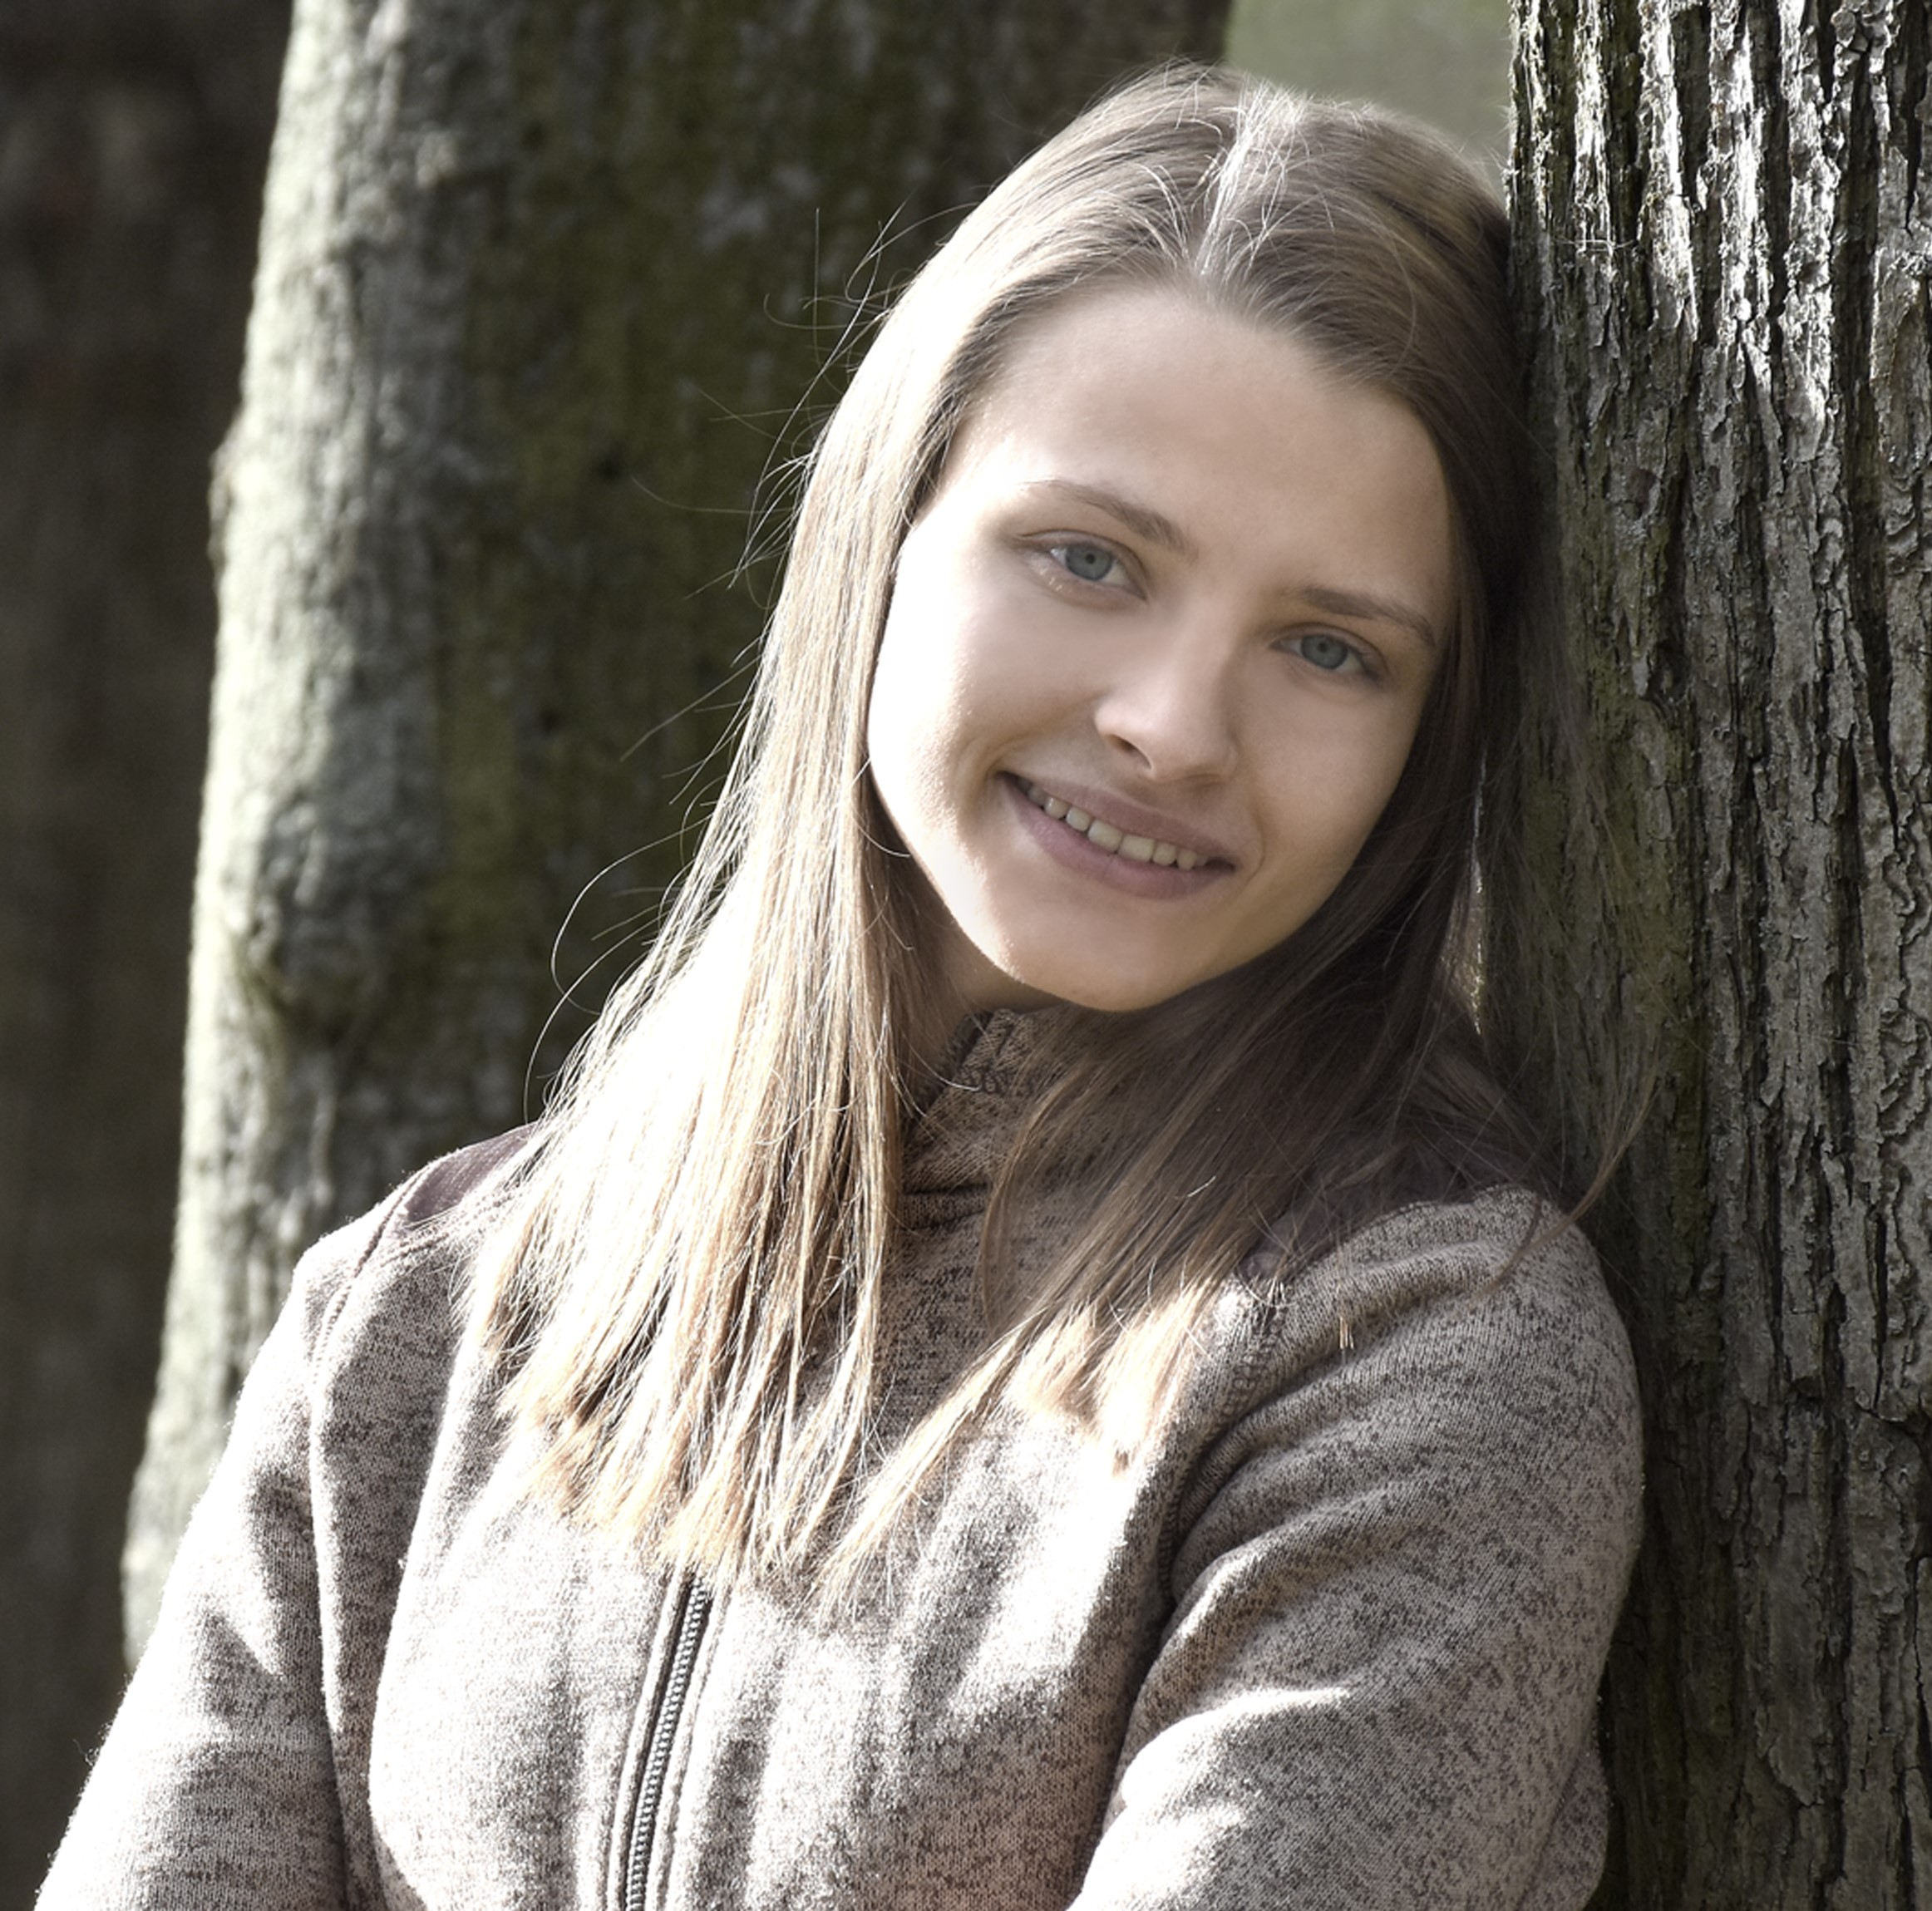 Tina Neumann (c) Anke Neumann